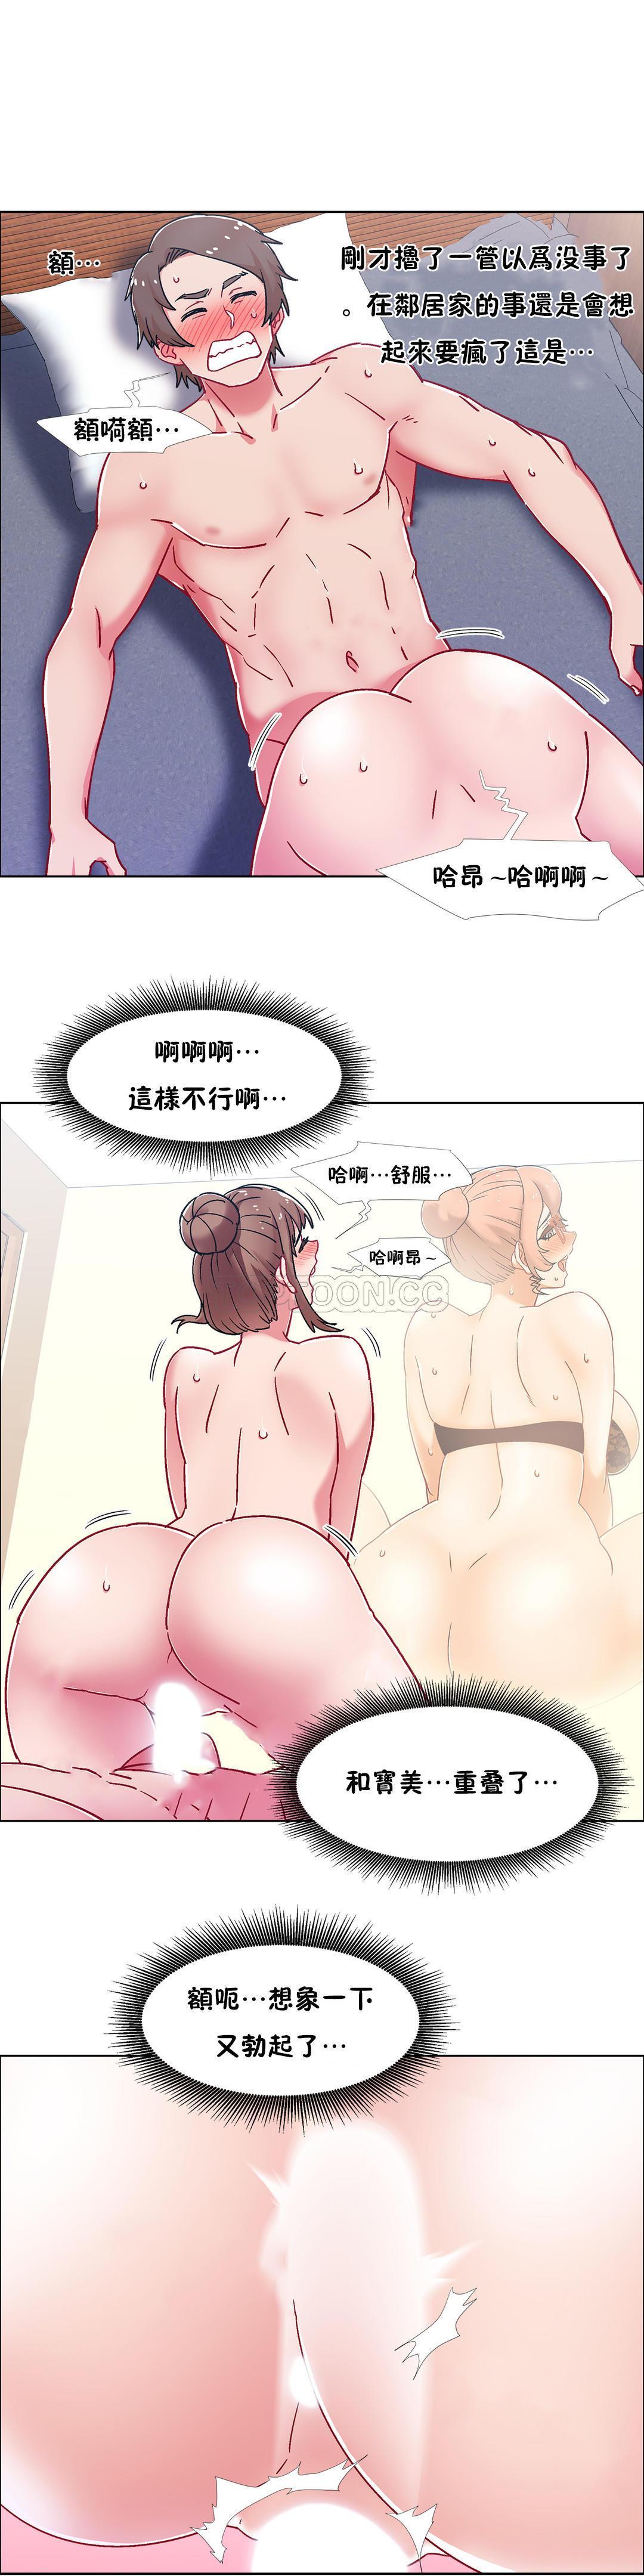 [Studio Wannabe] Rental Girls | 出租女郎 Ch. 33-58 [Chinese]  第二季 完结 413